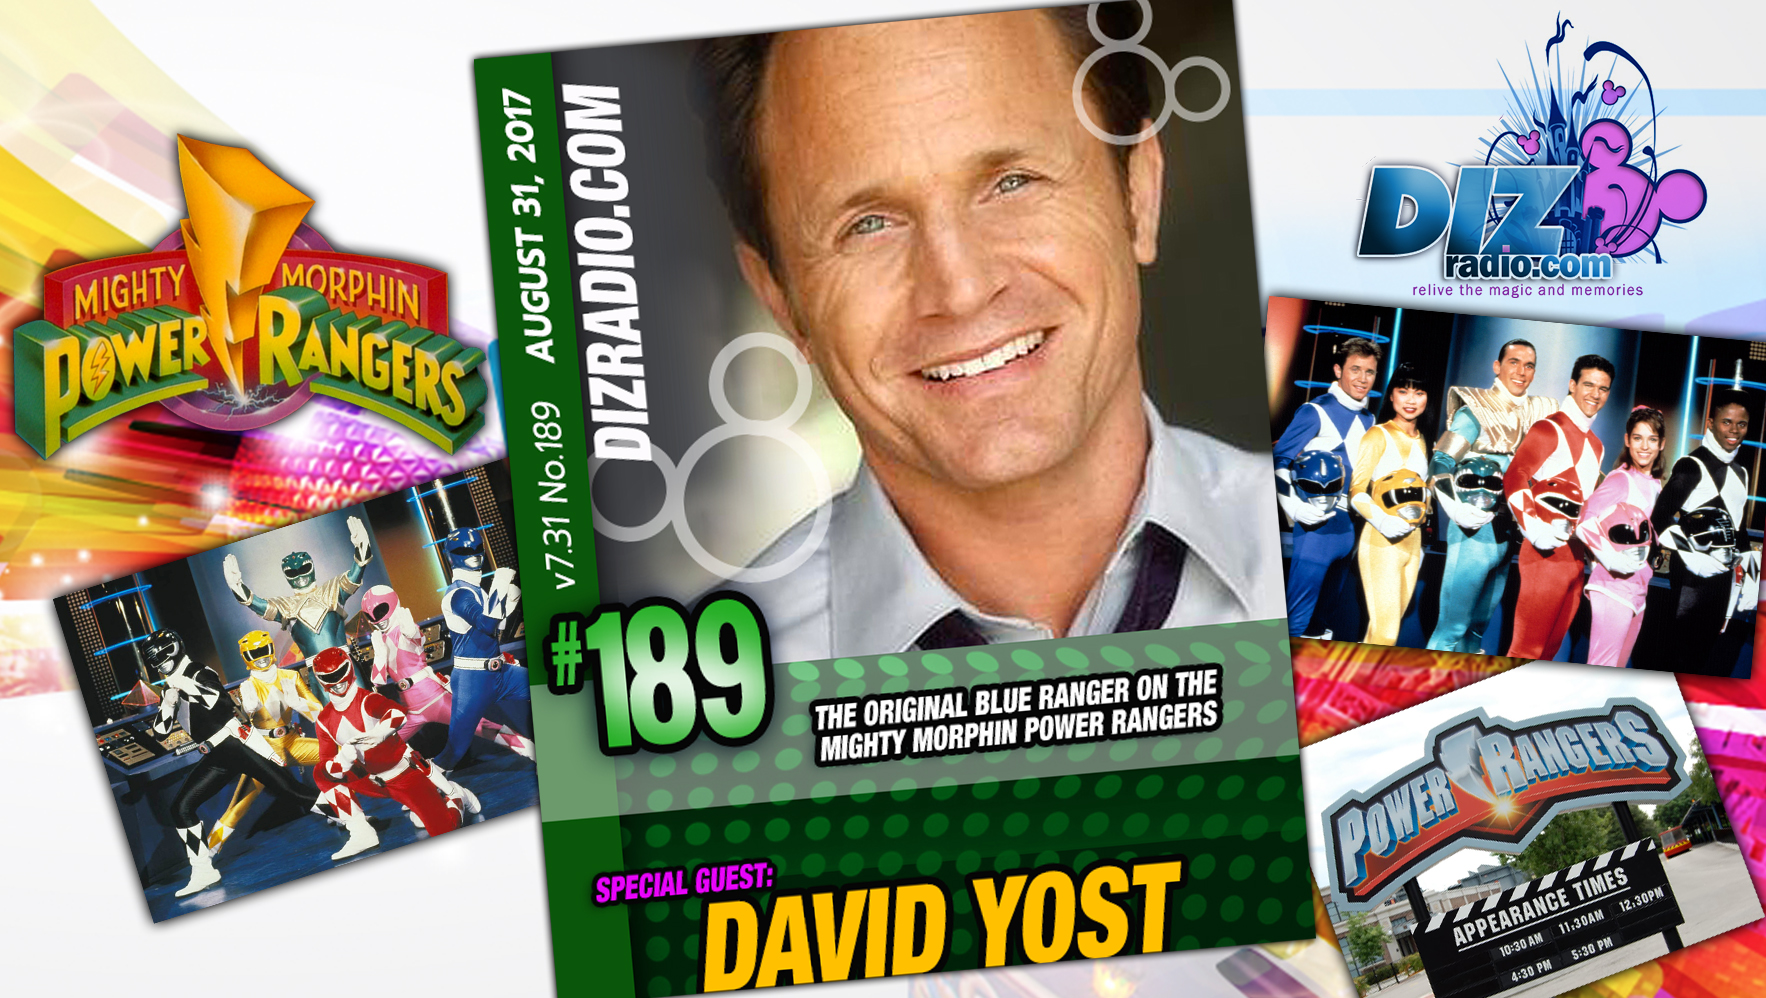 DisneyBlu's DizRadio Disney on Demand Podcast Show #189 w/ Guest DAVID YOST (The Original Blue Range in Mighty Morphin Power Rangers, Actor, Producer)